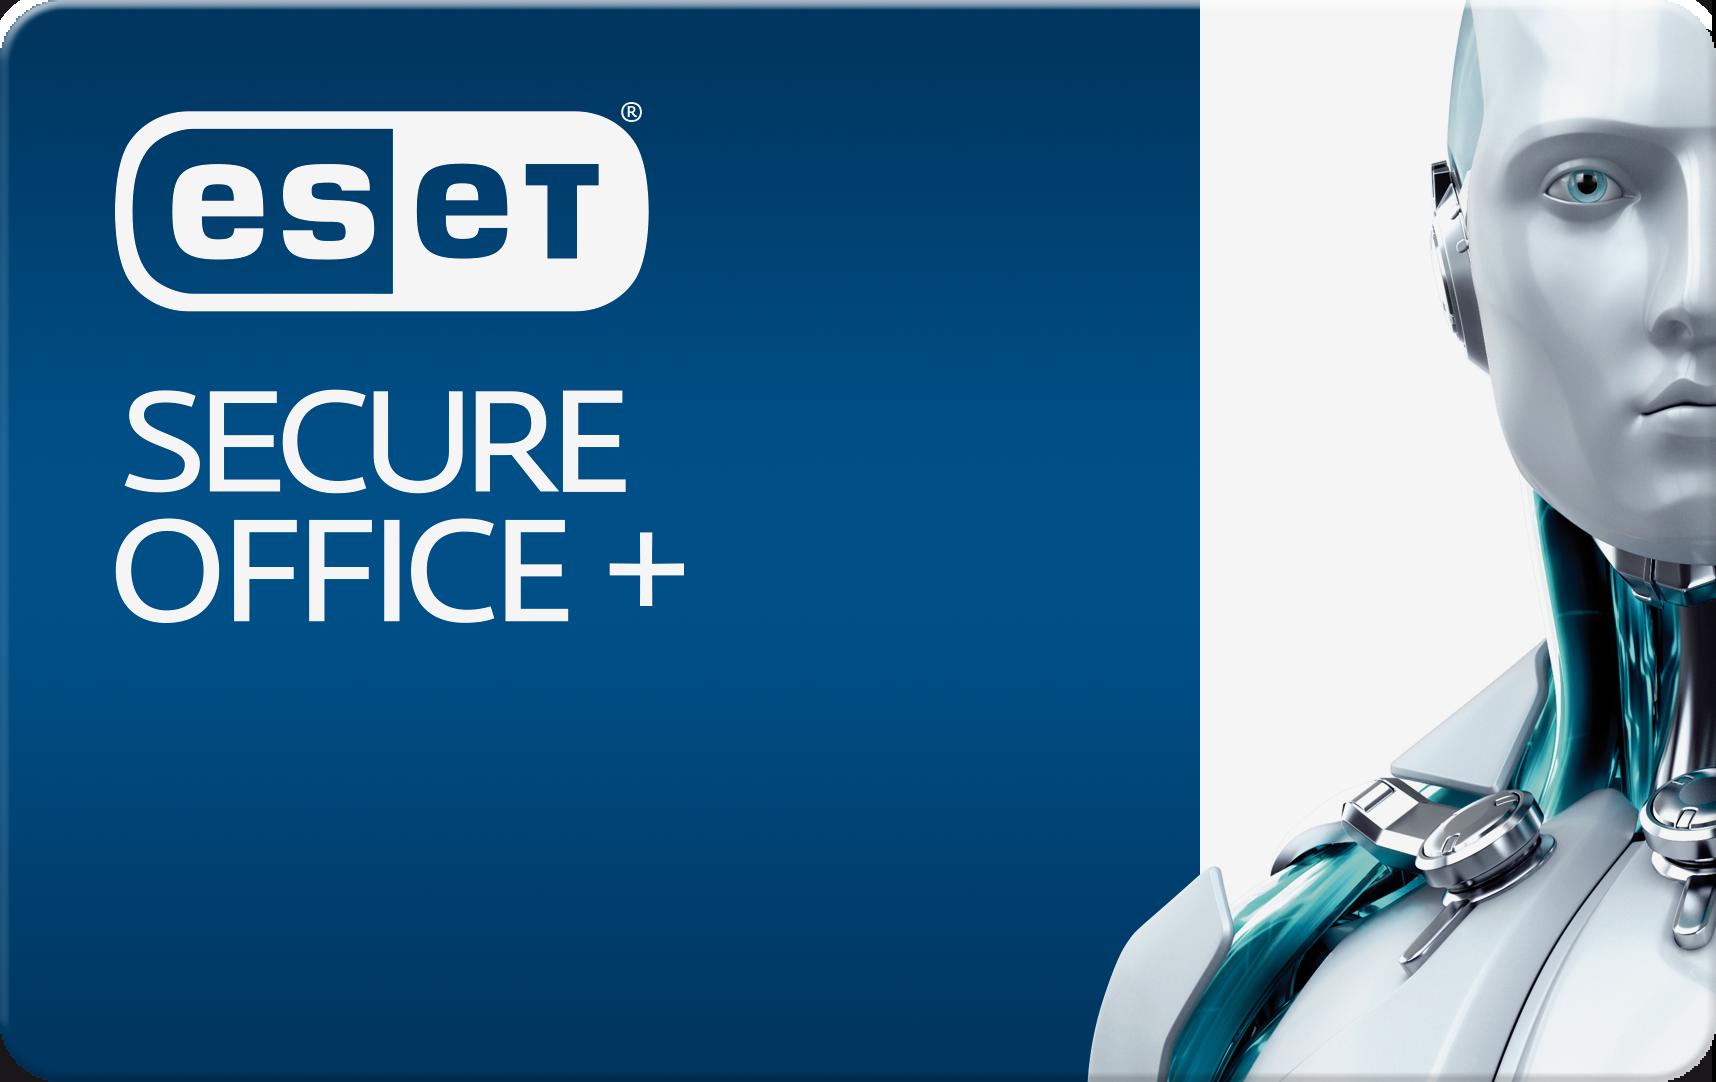 card---eset-secure-office-plus.png